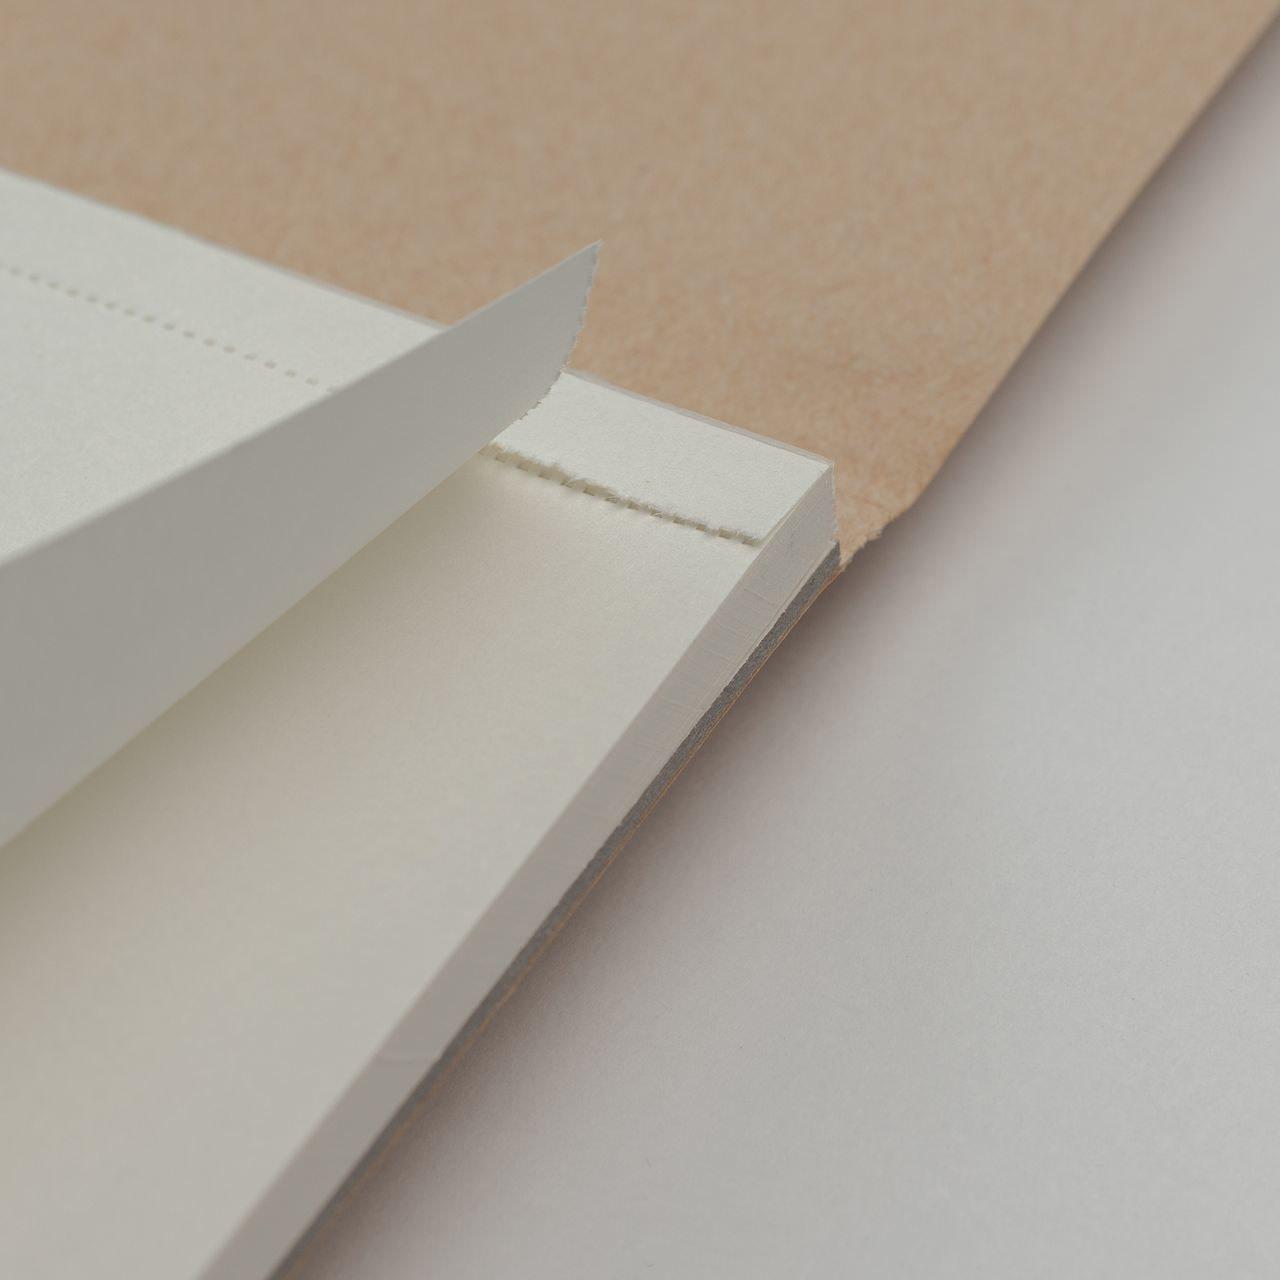 A5 Крафтовый скетчбук с перфорацией Falafel books Sketchbook Straw